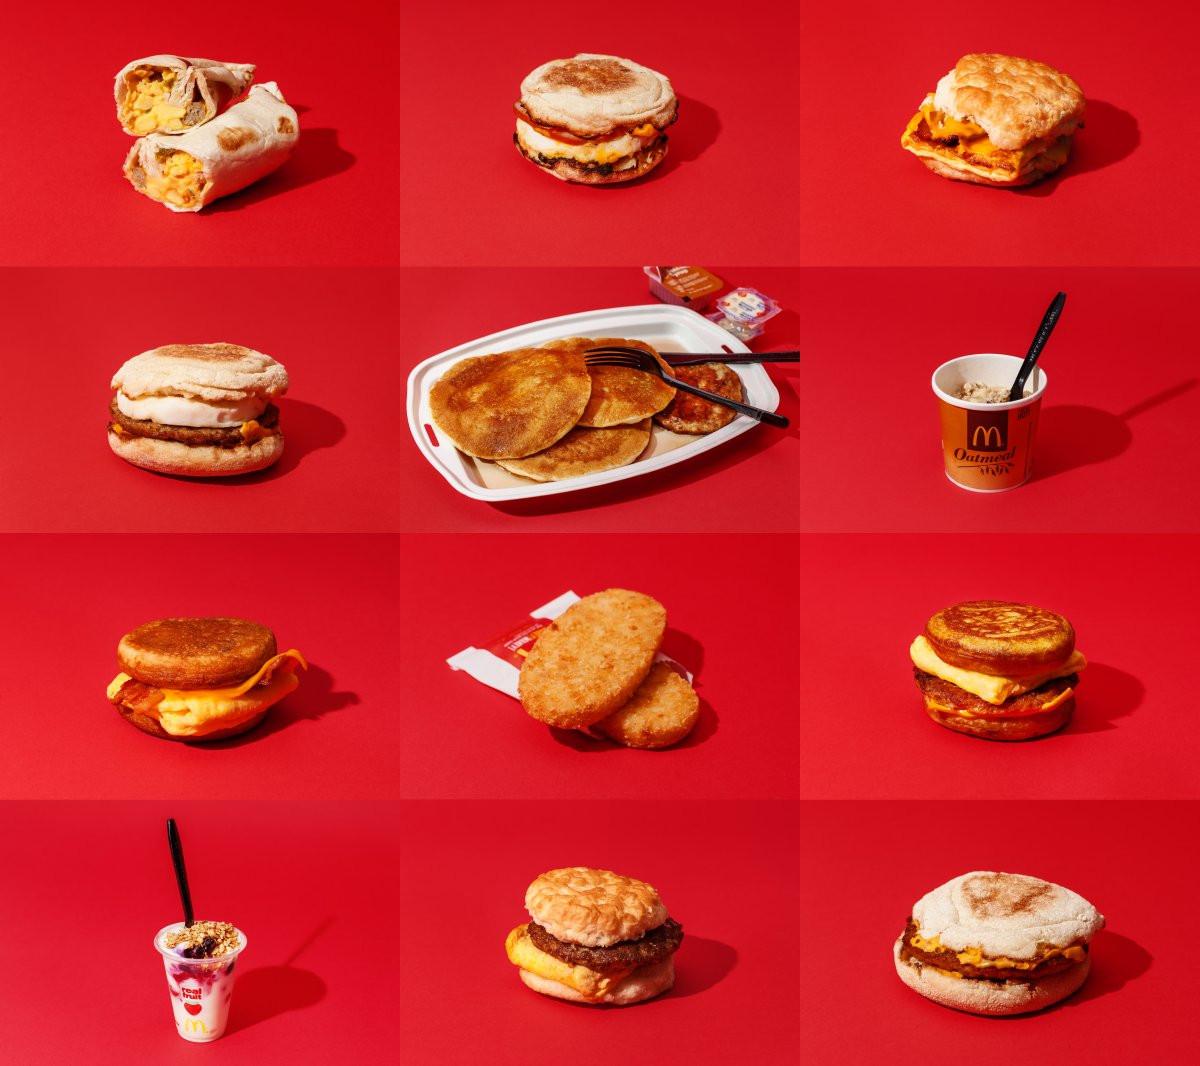 Mcdonalds Healthy Breakfast Menu  Best items on McDonald s All Day Breakfast menu Business